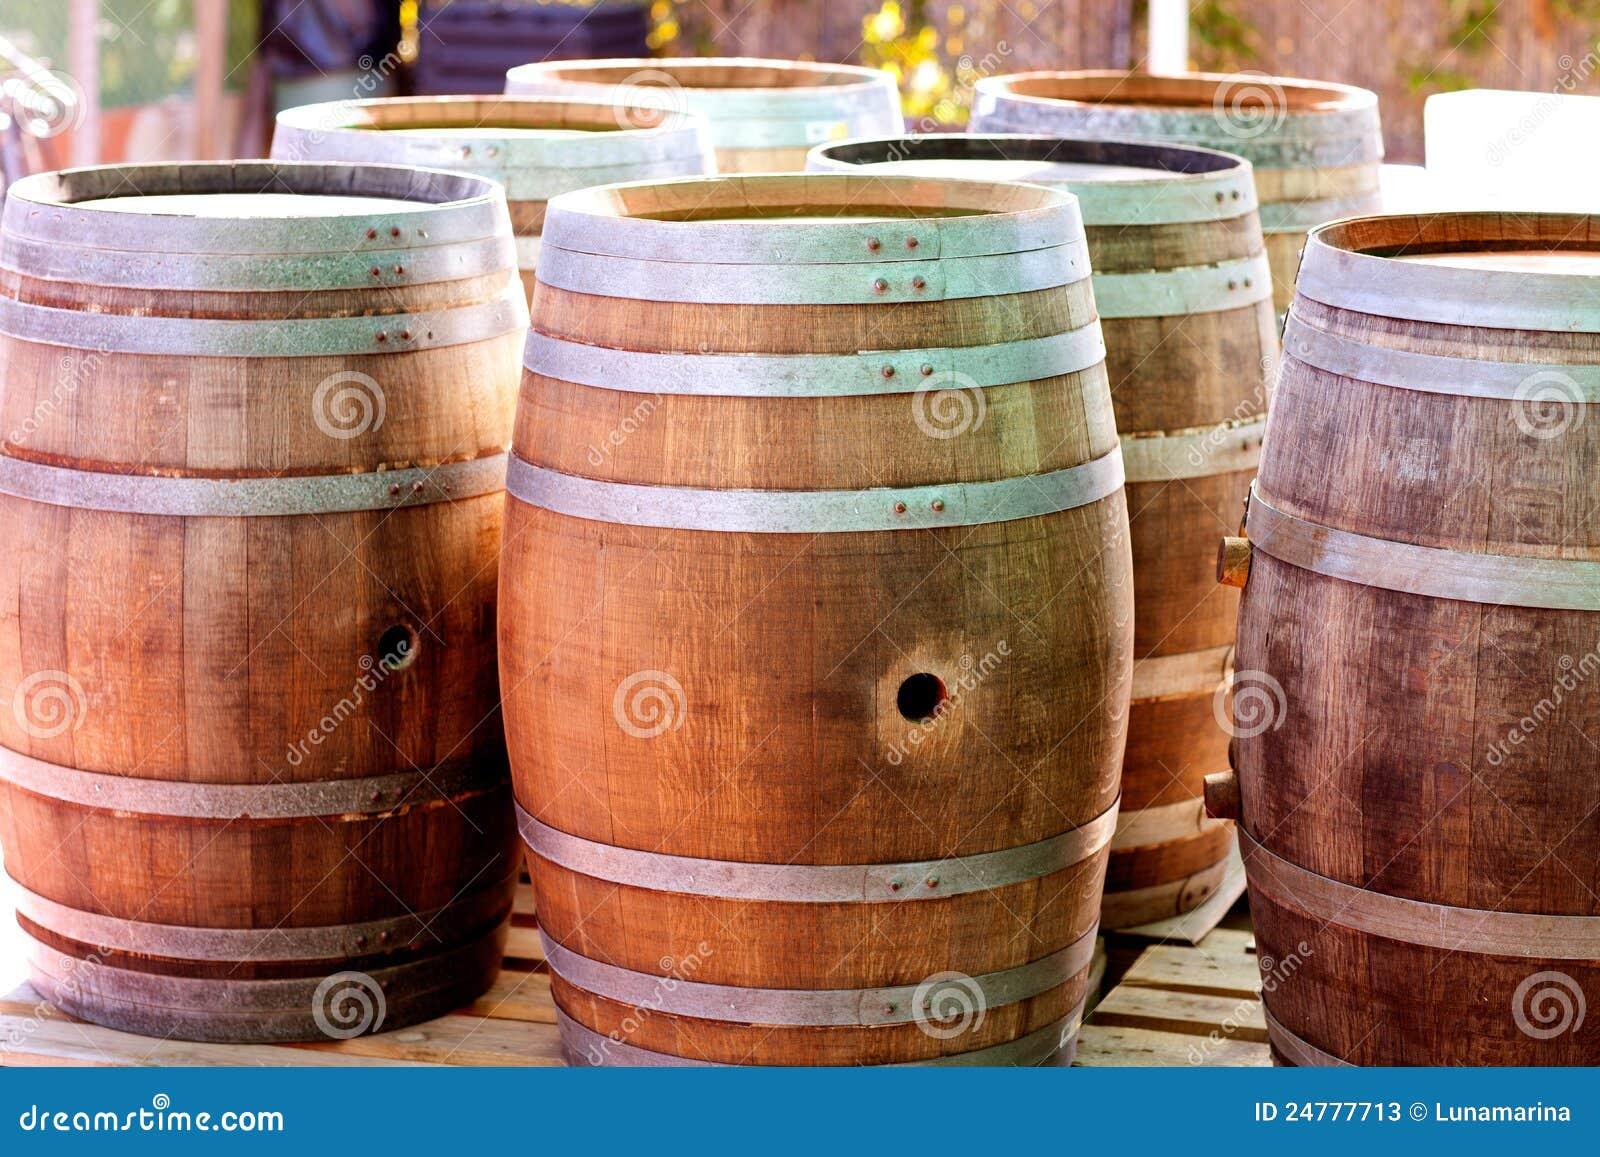 Barriles de madera de roble para el vino o el licor fotos for Barriles de madera bar